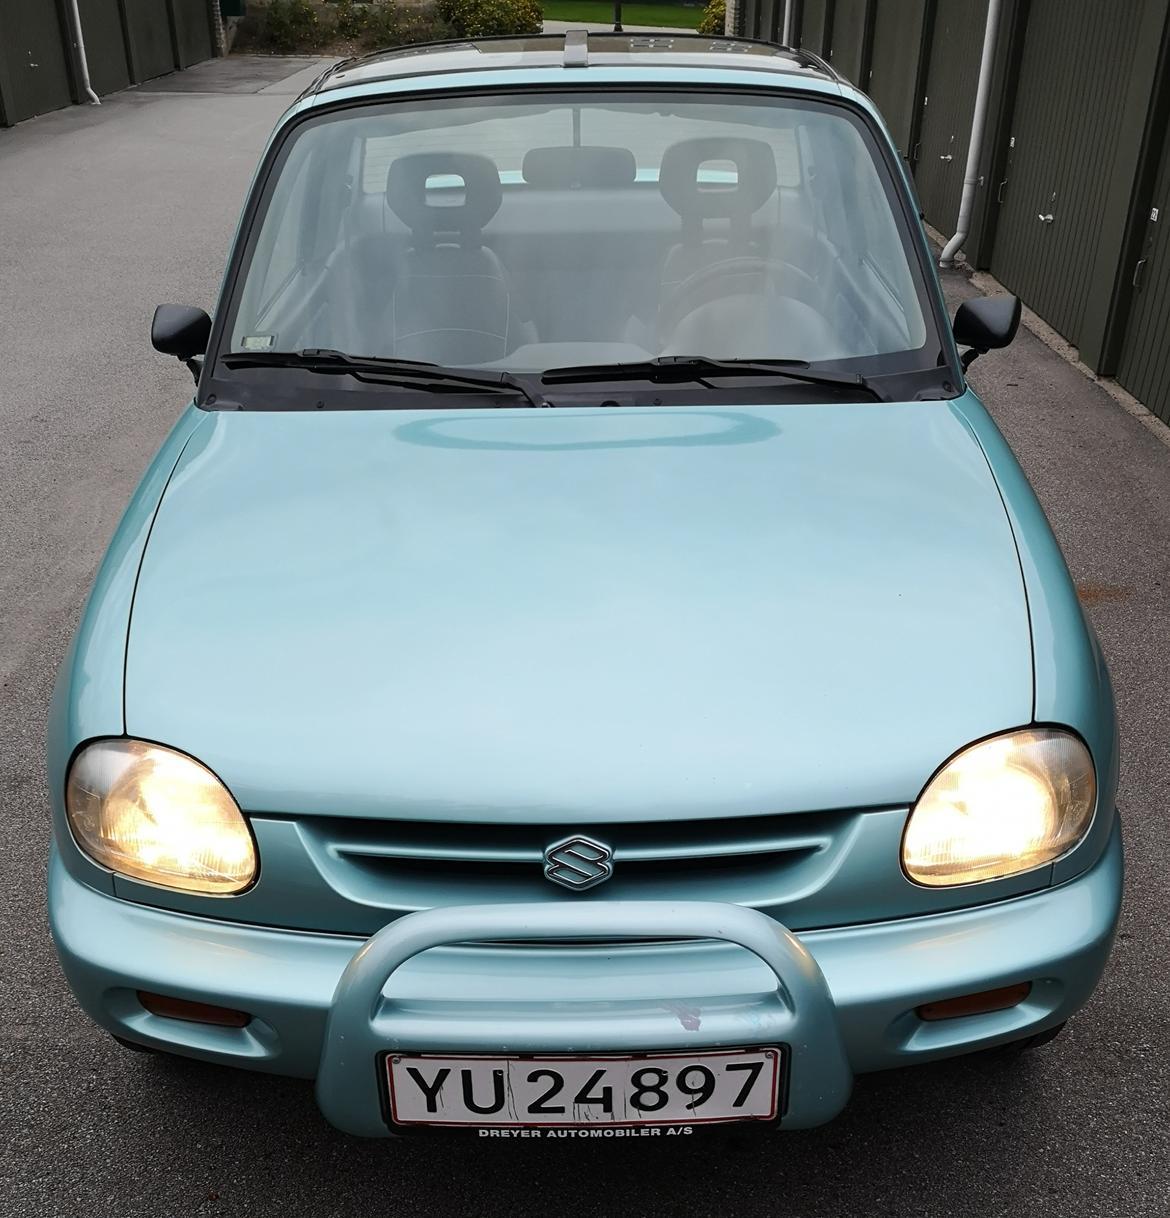 Suzuki Vitara X90 (SZ416) 1,6 4x4  billede 13